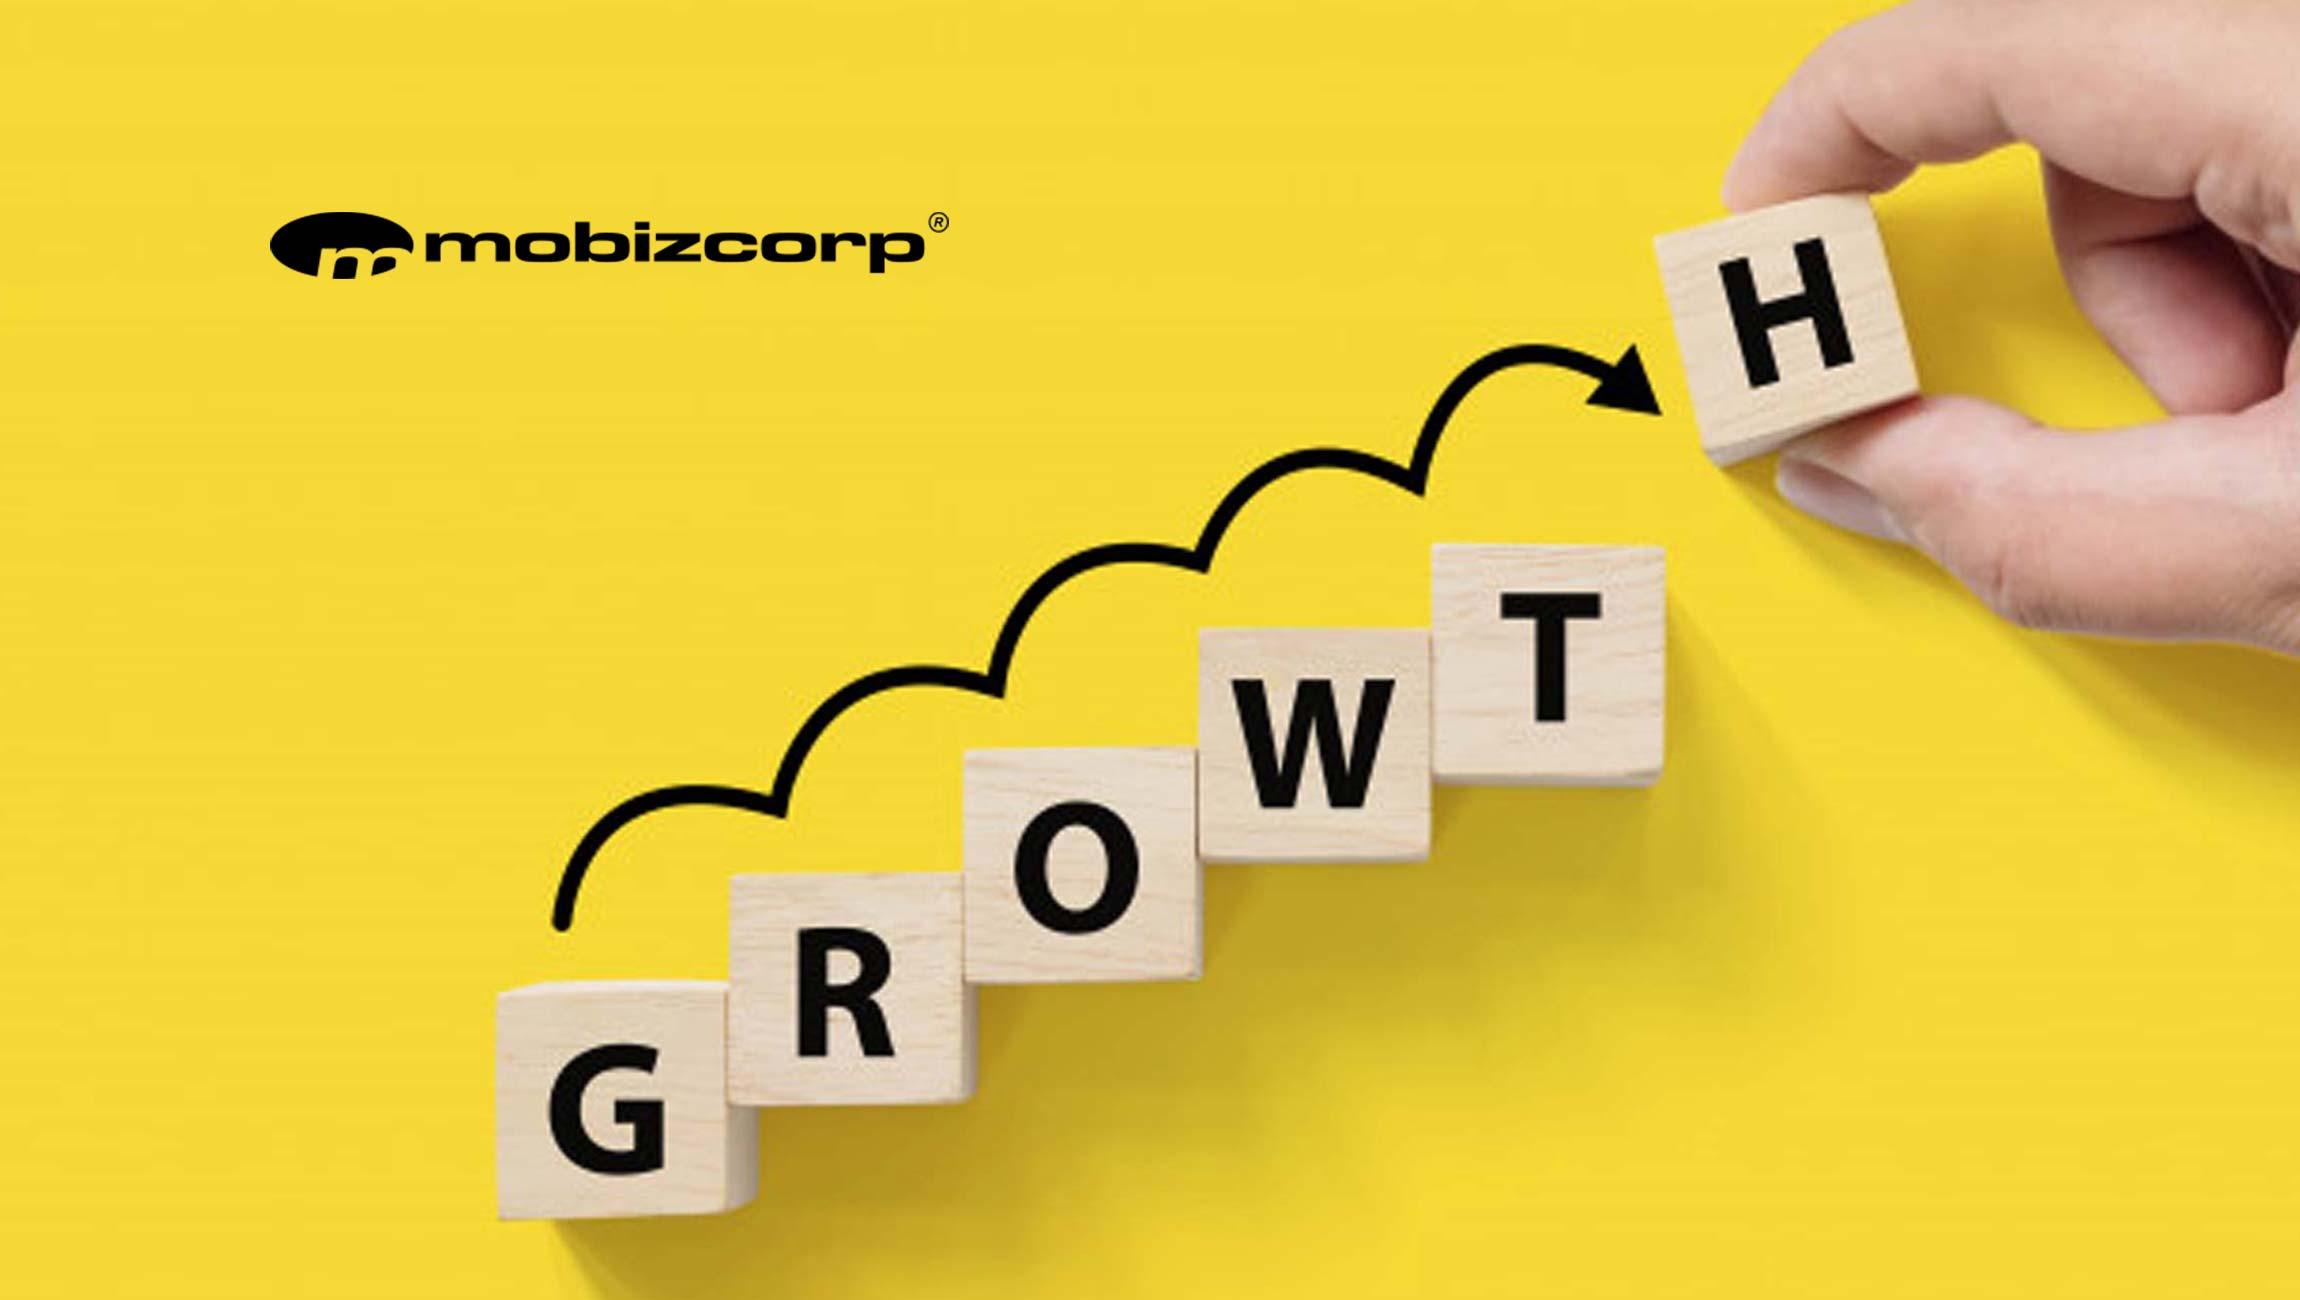 Incloud Announces Strategic Partnership With Mobizcorp